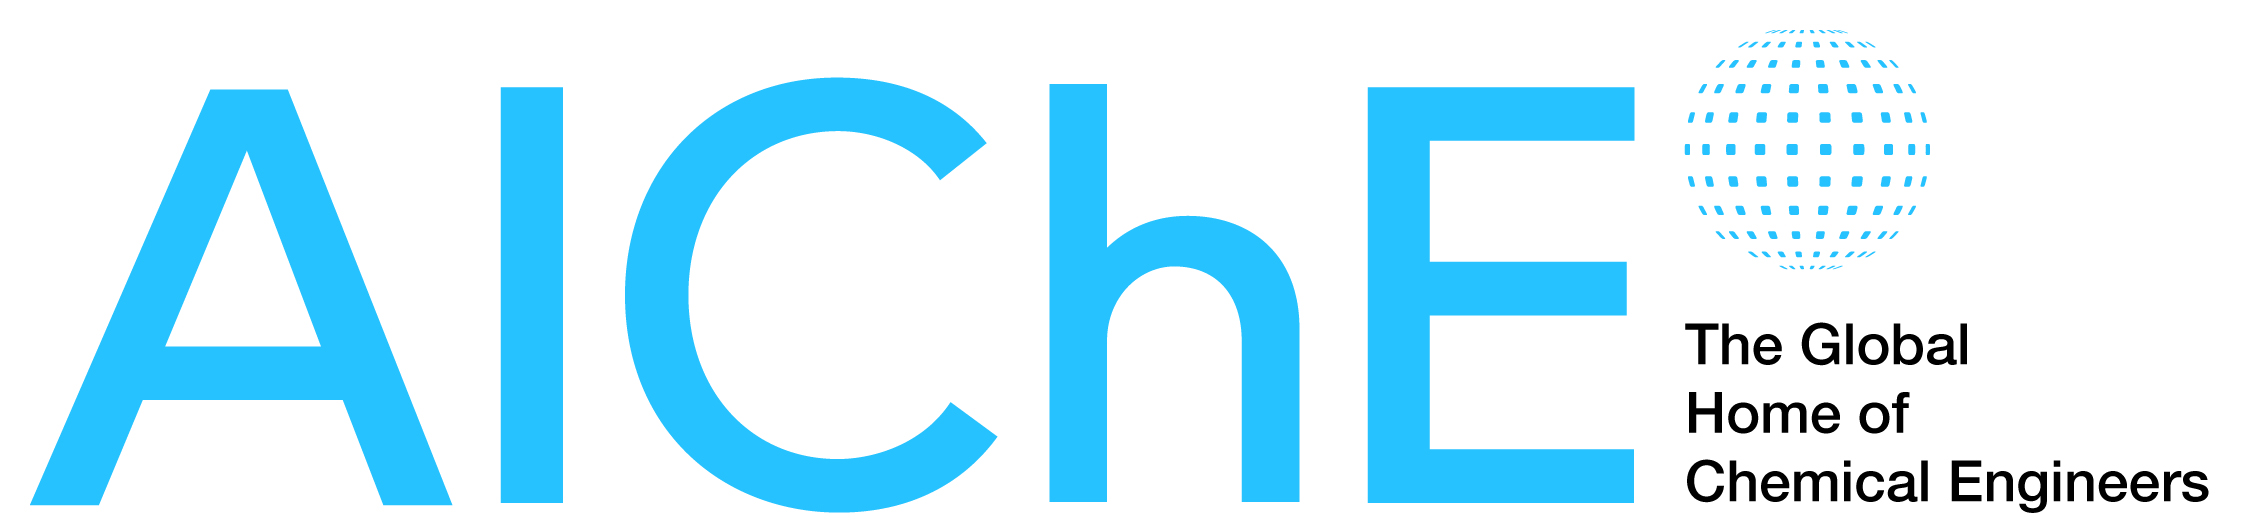 aiche-dawog-logo.png